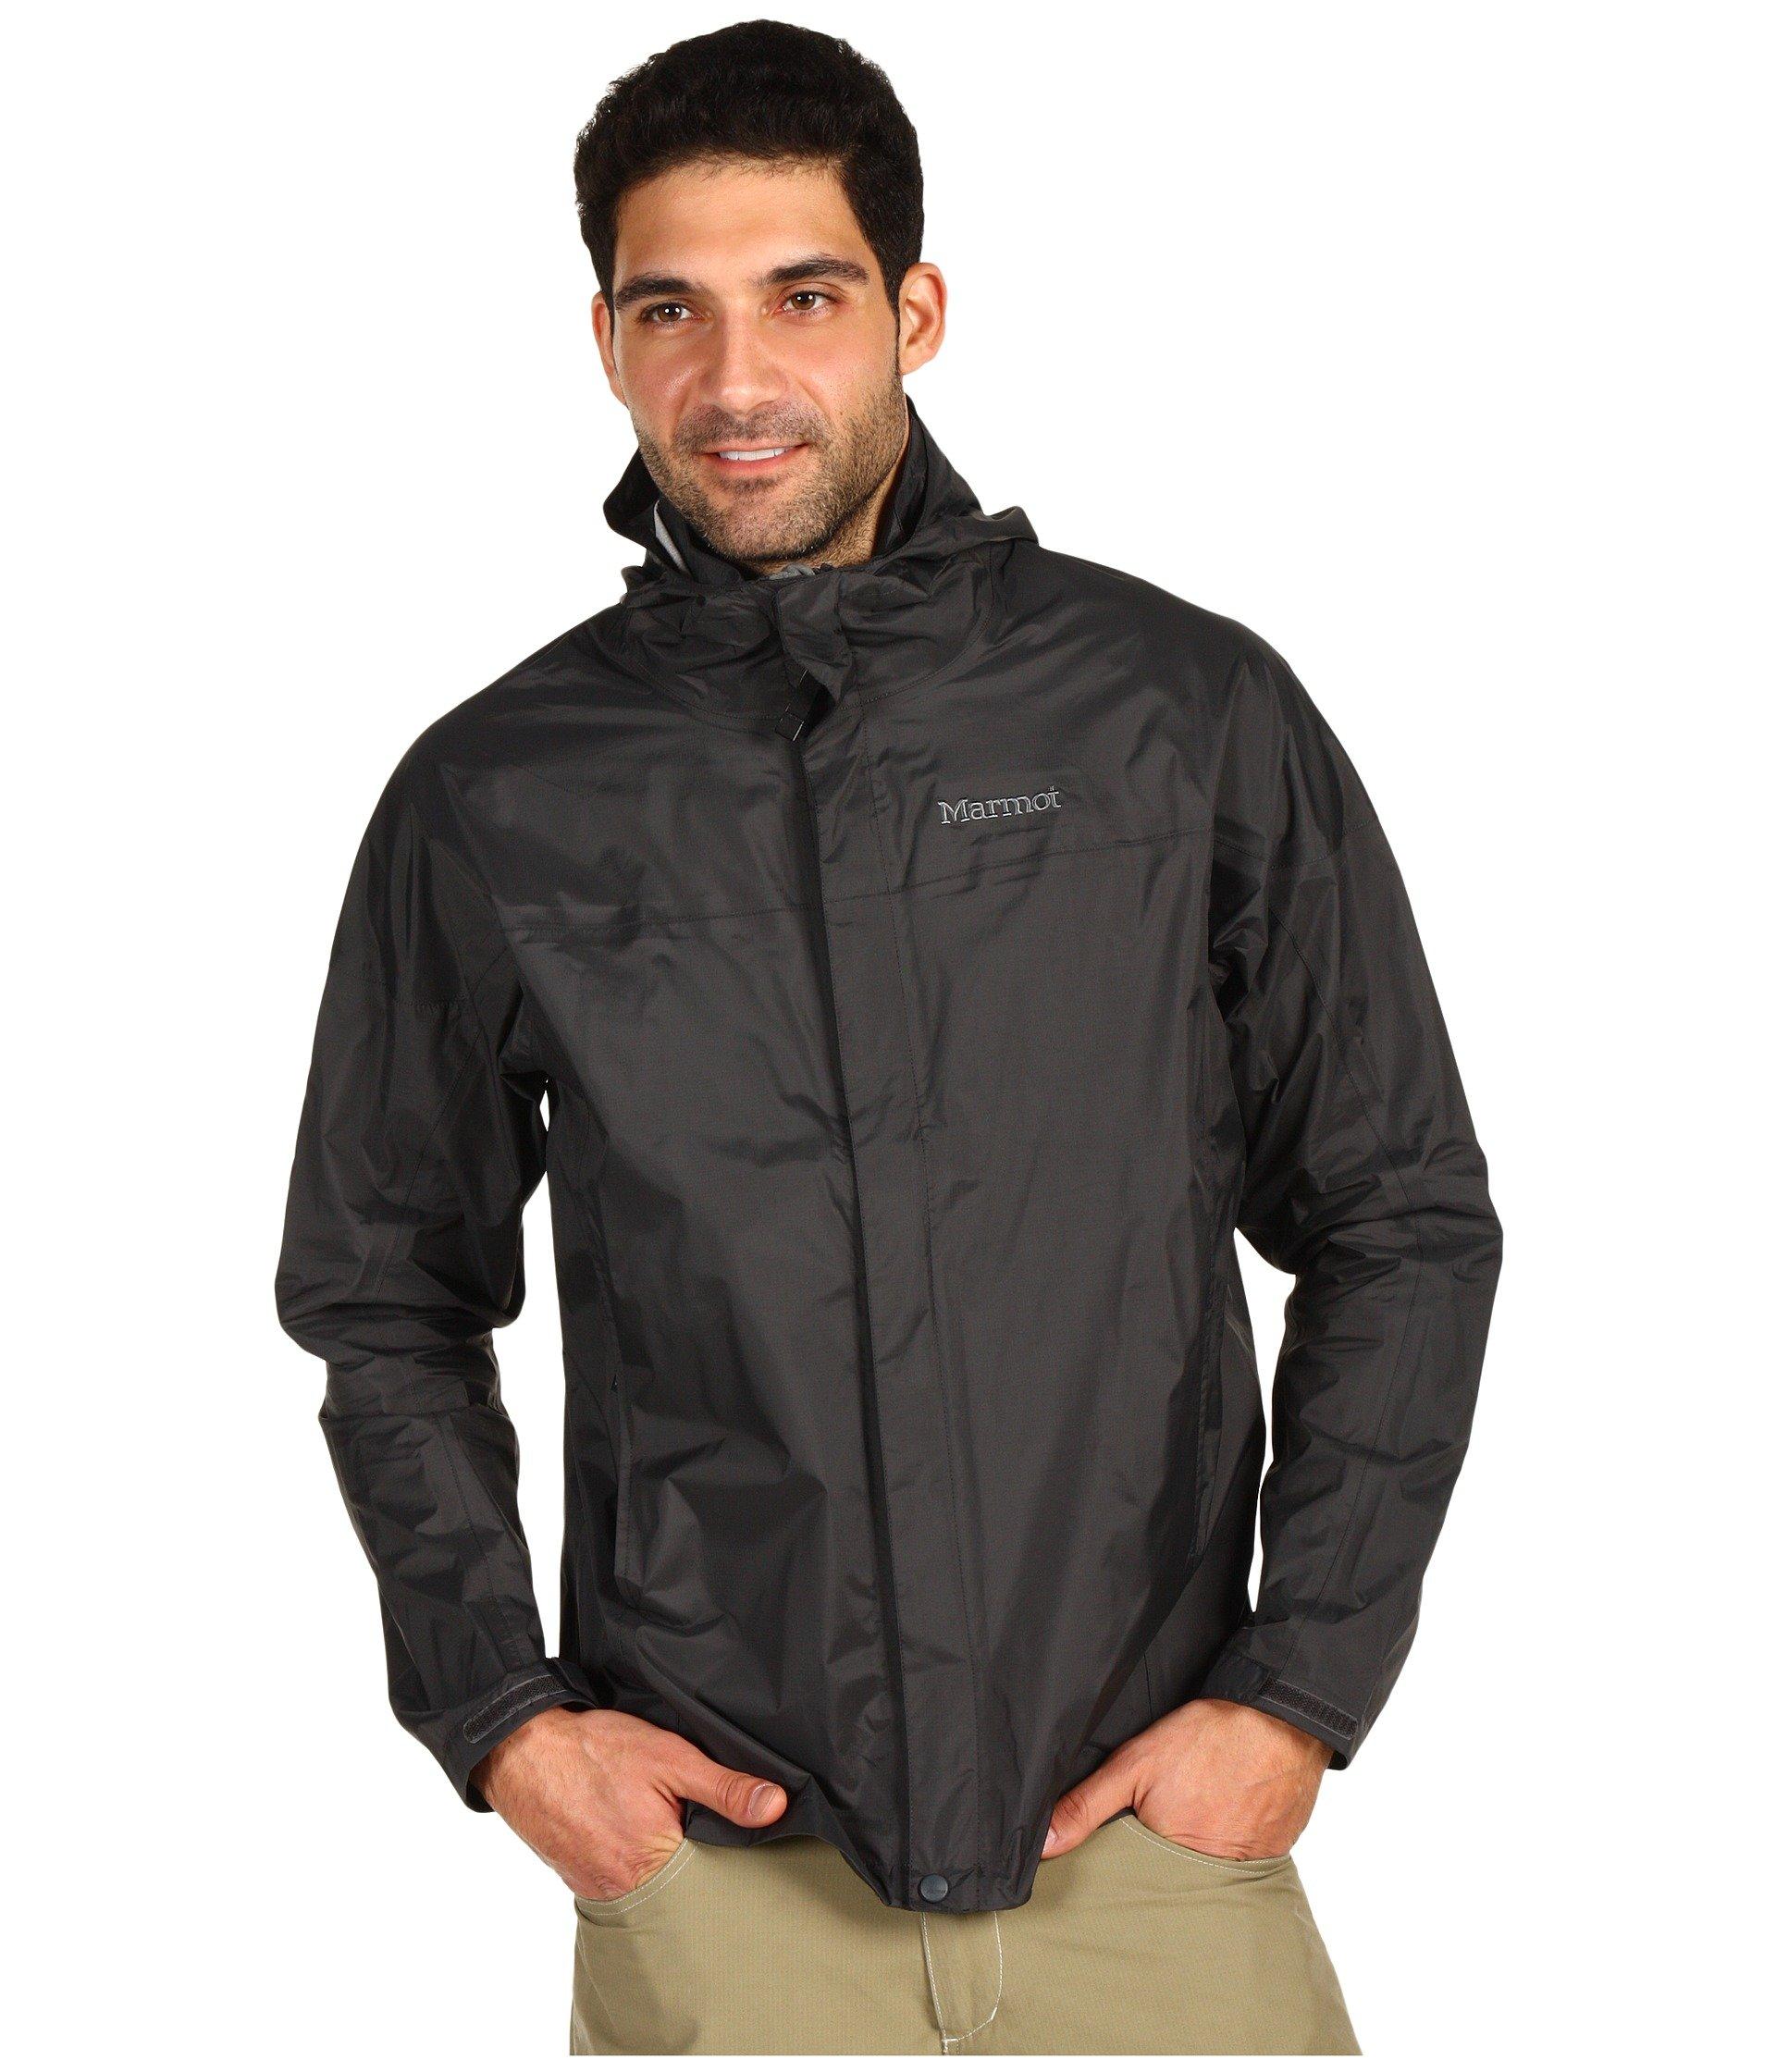 Marmot Men's Precip Jacket, Slate Grey, Medium by Marmot